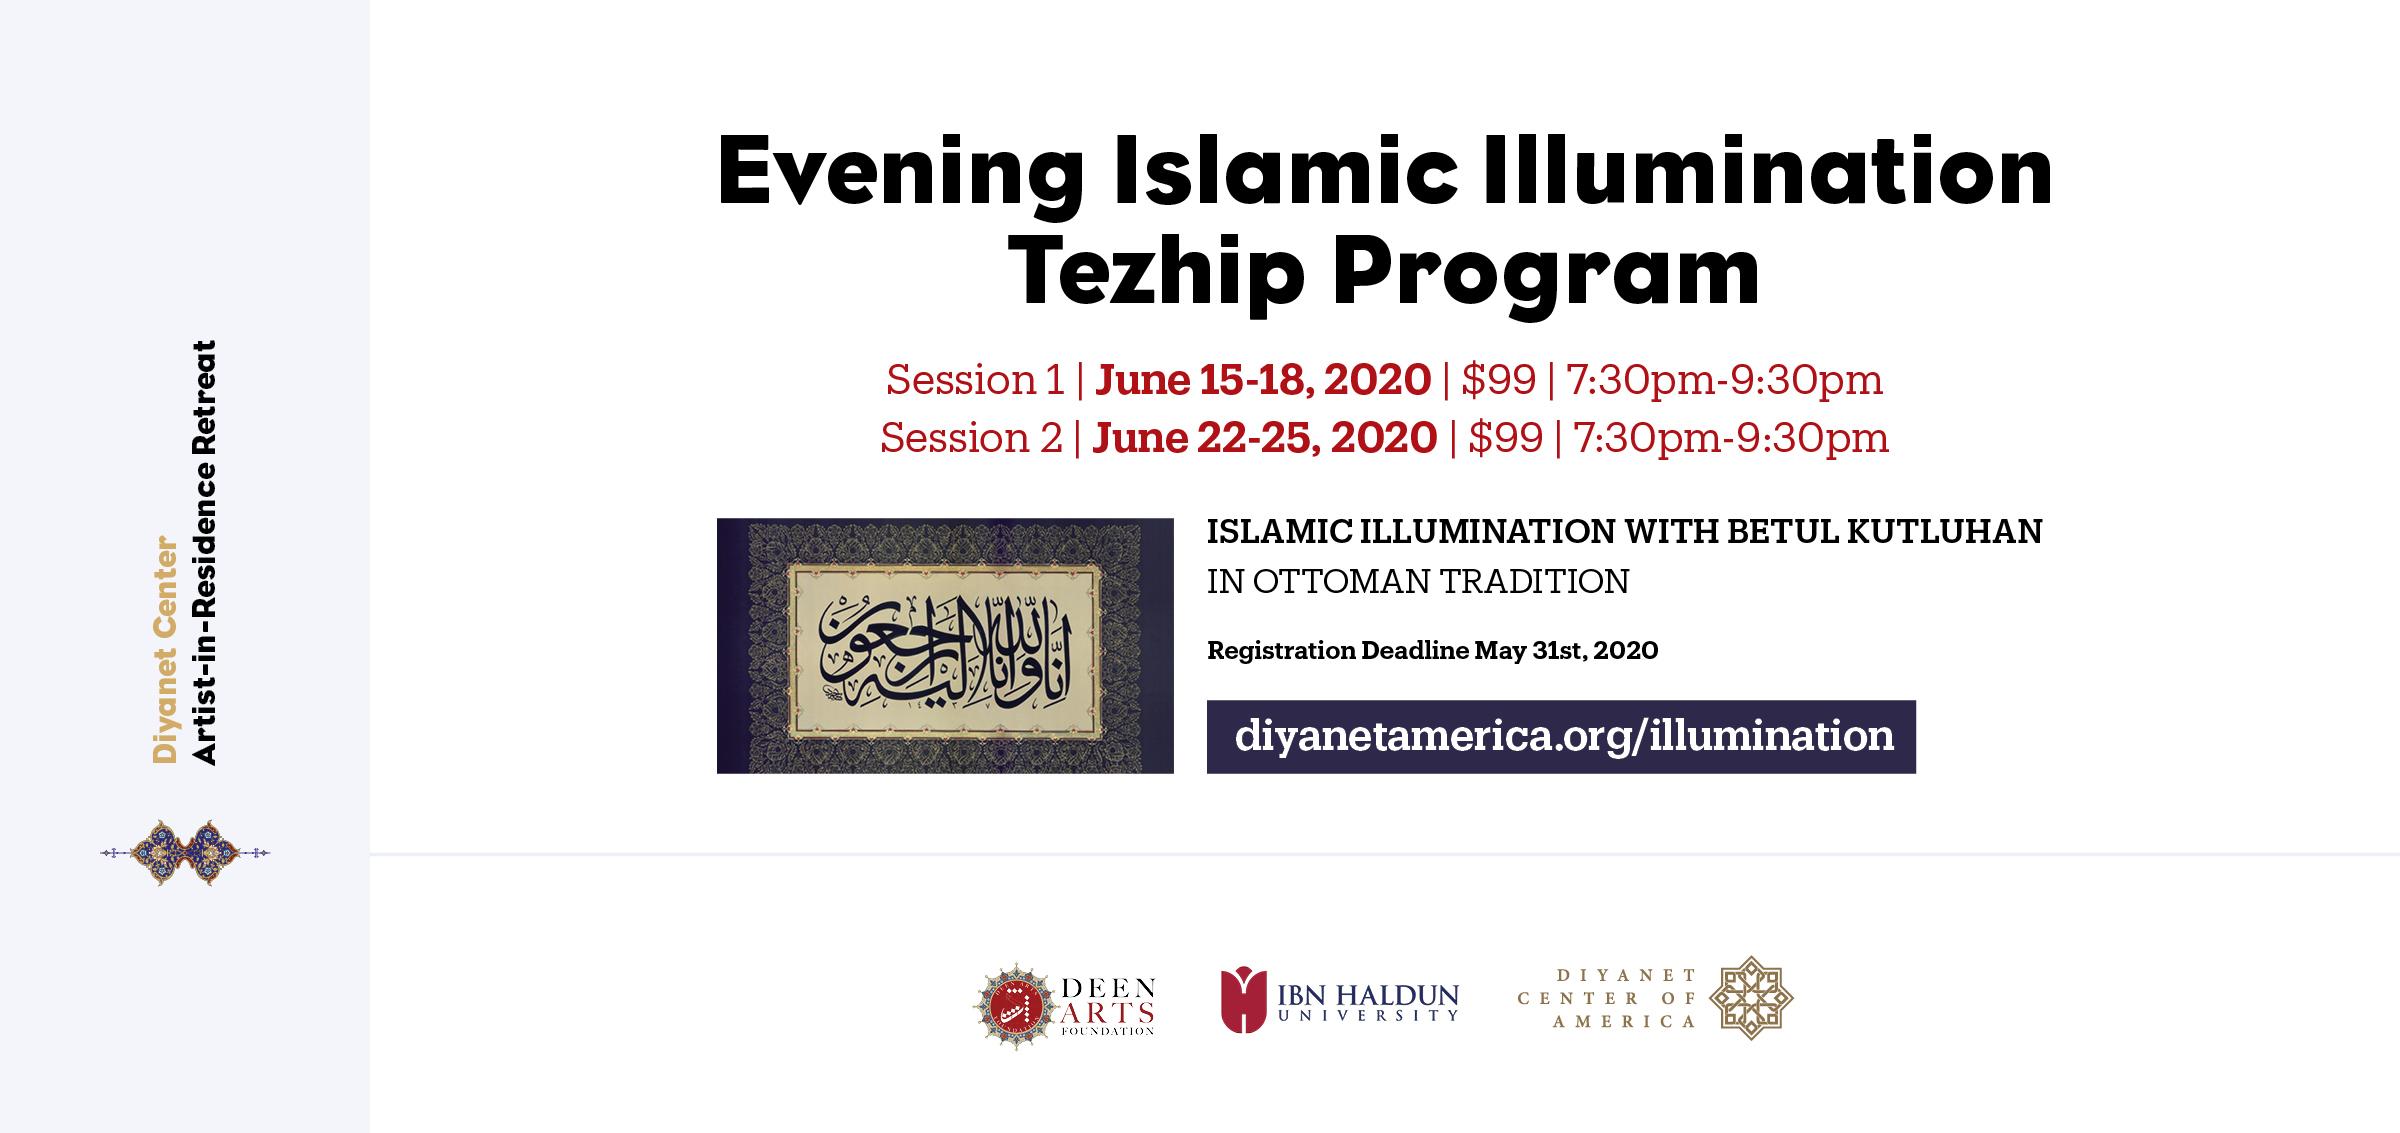 Islamic Illumination - Tezhip Evening Program - Artist-in-Residence Retreat